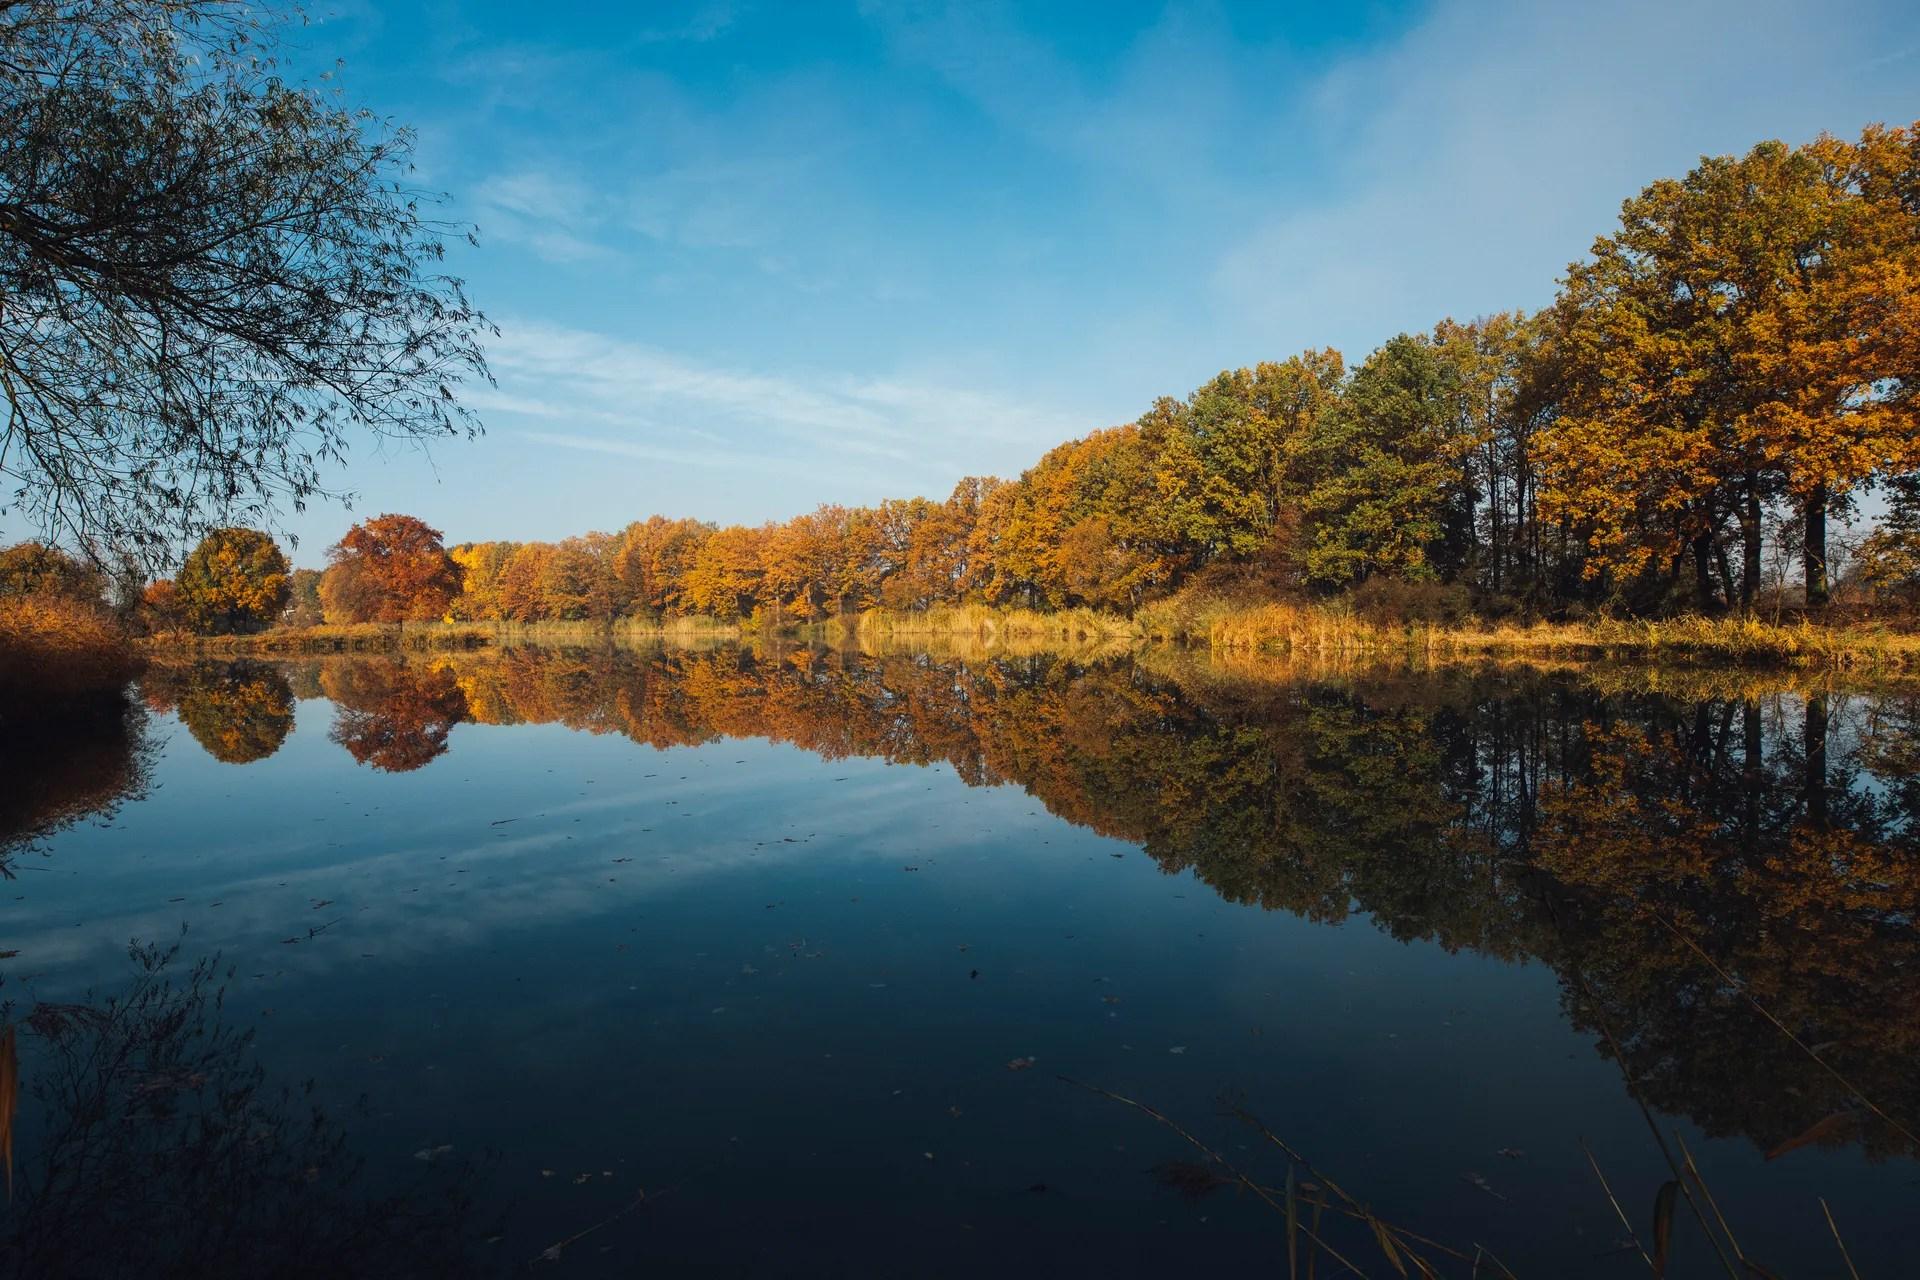 Fall Colors Wallpaper New England Autumn Foliage Above A Bridge Widescreen Wallpaper Wide